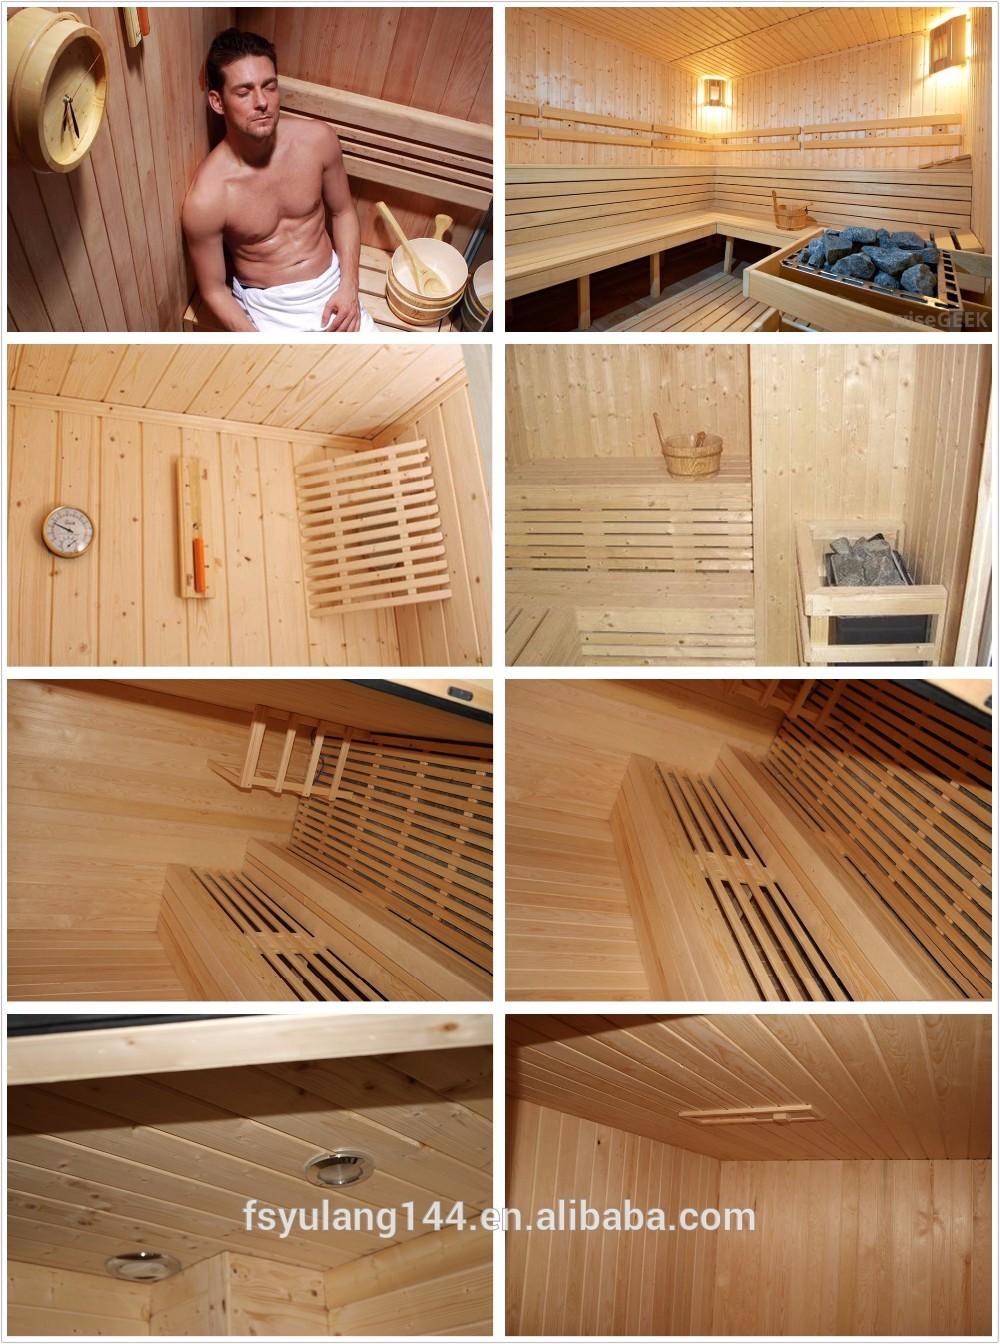 sauna room details-1